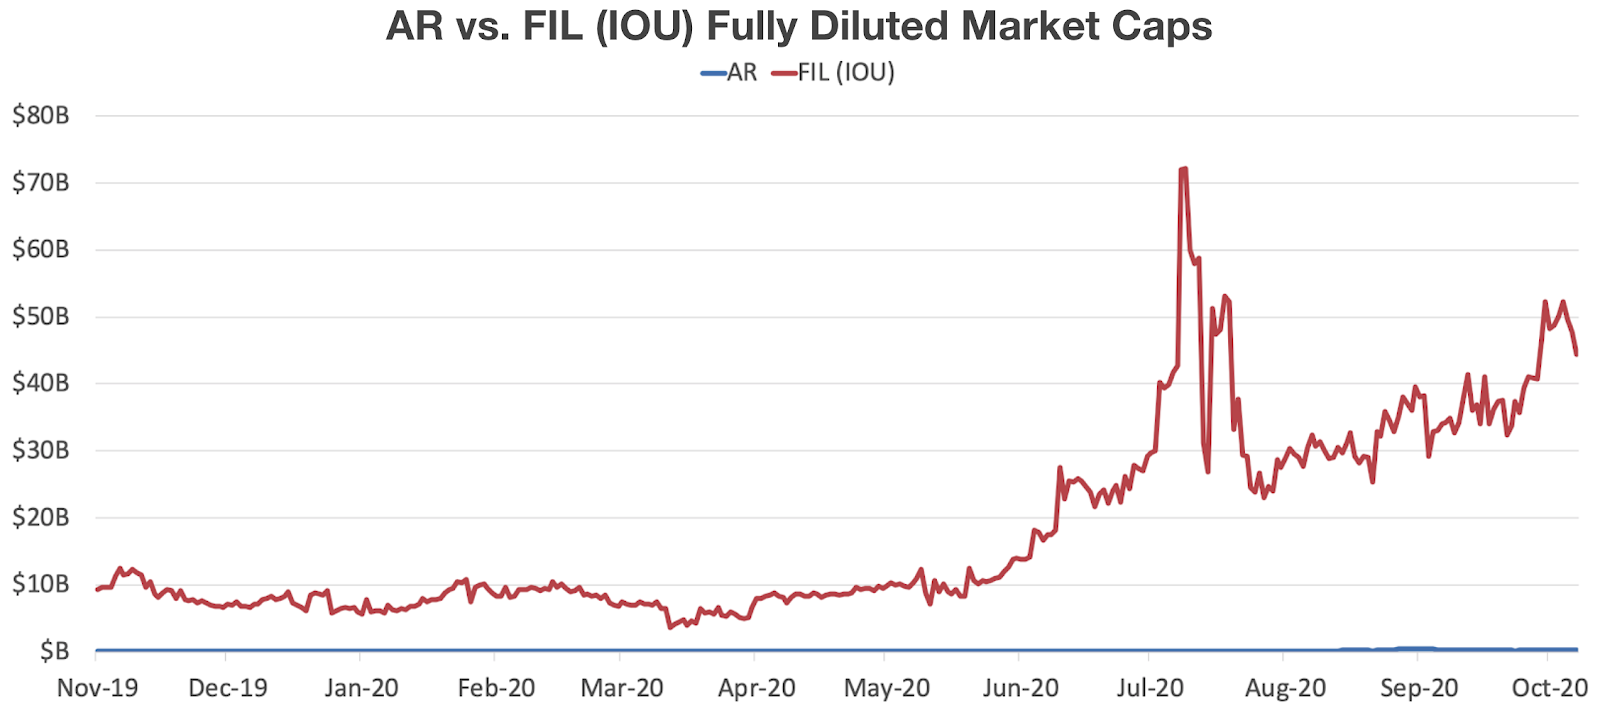 ar vs. fil (IU) fully diluted market caps